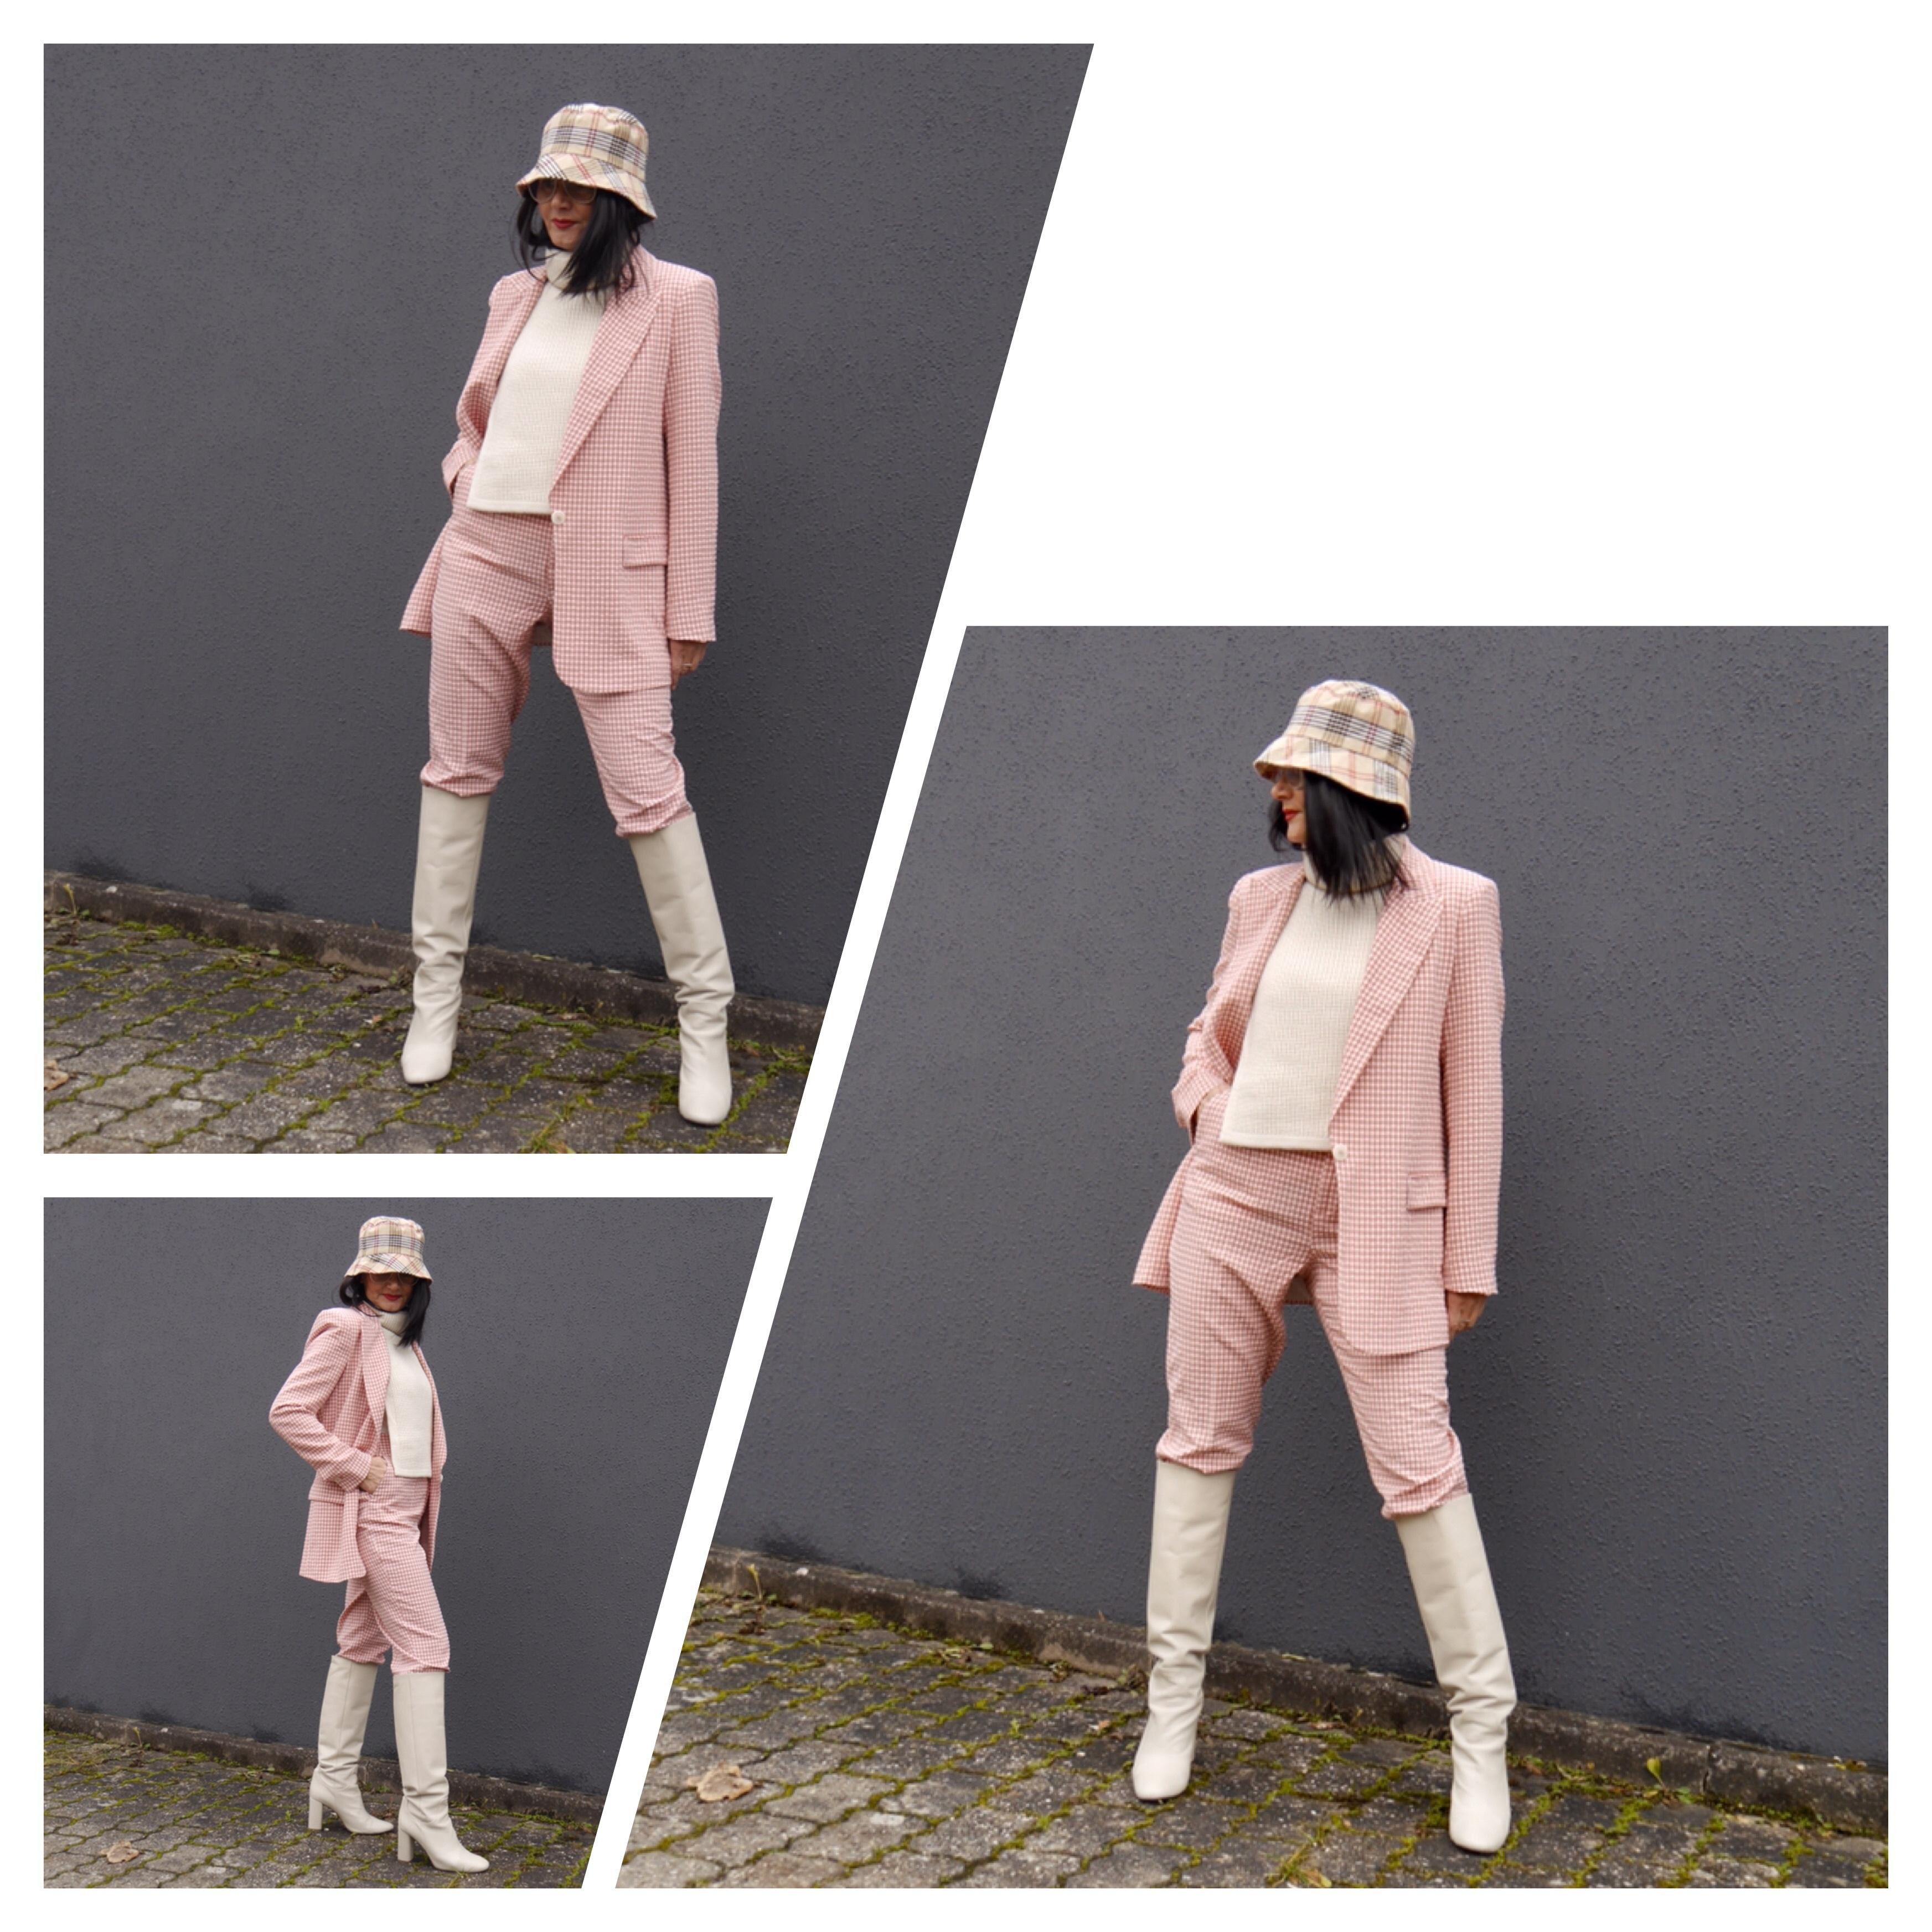 Burberry Hut, Unterziehpulli, weiße Stiefel, Pepita-Anzug